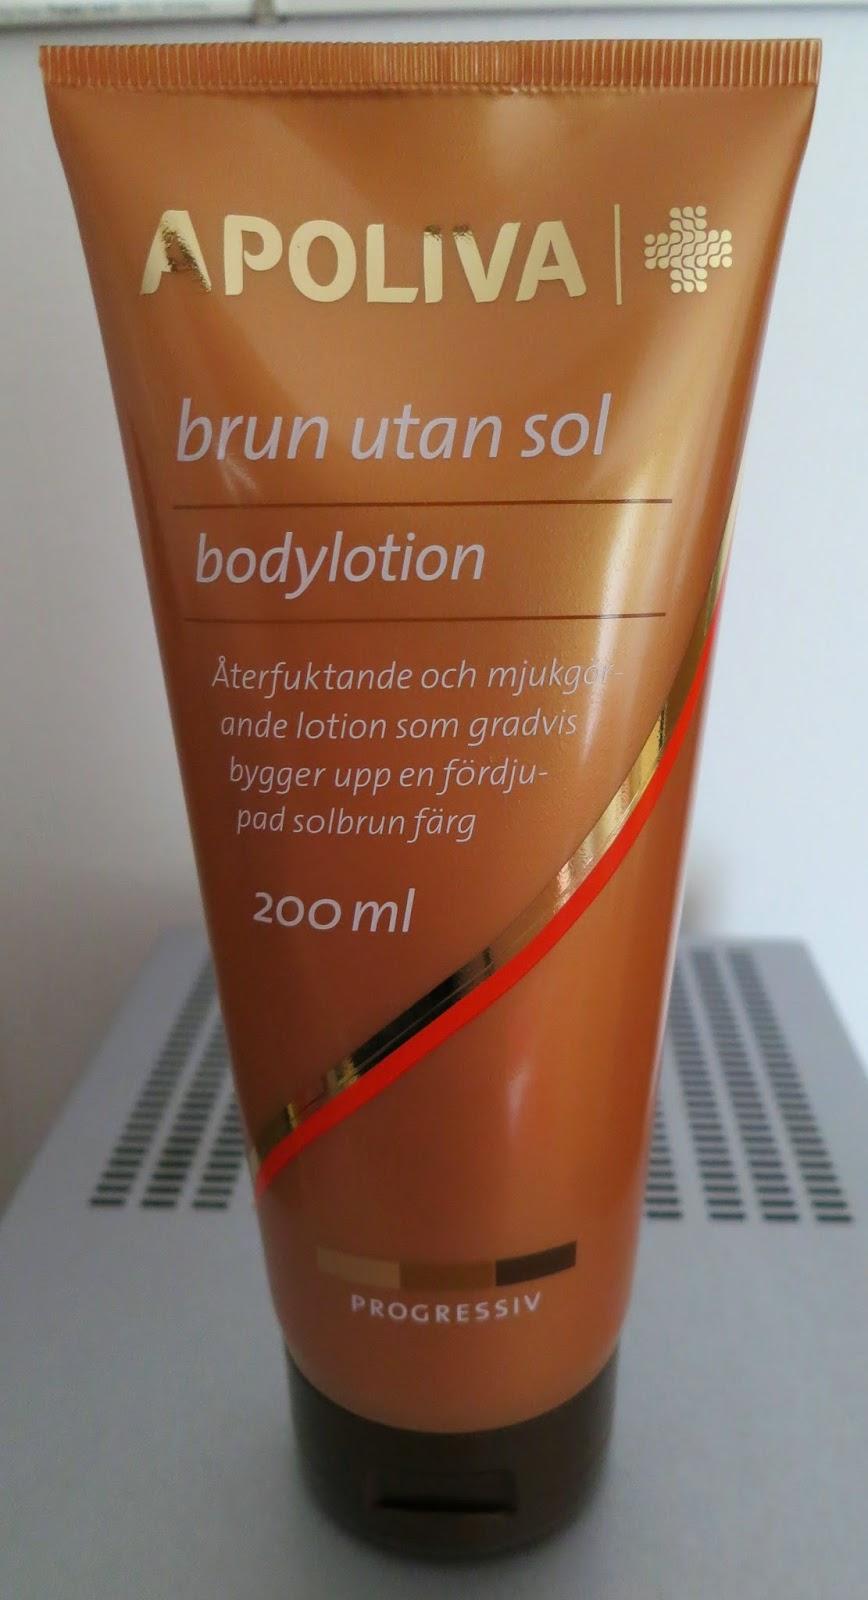 apoliva brun utan sol test